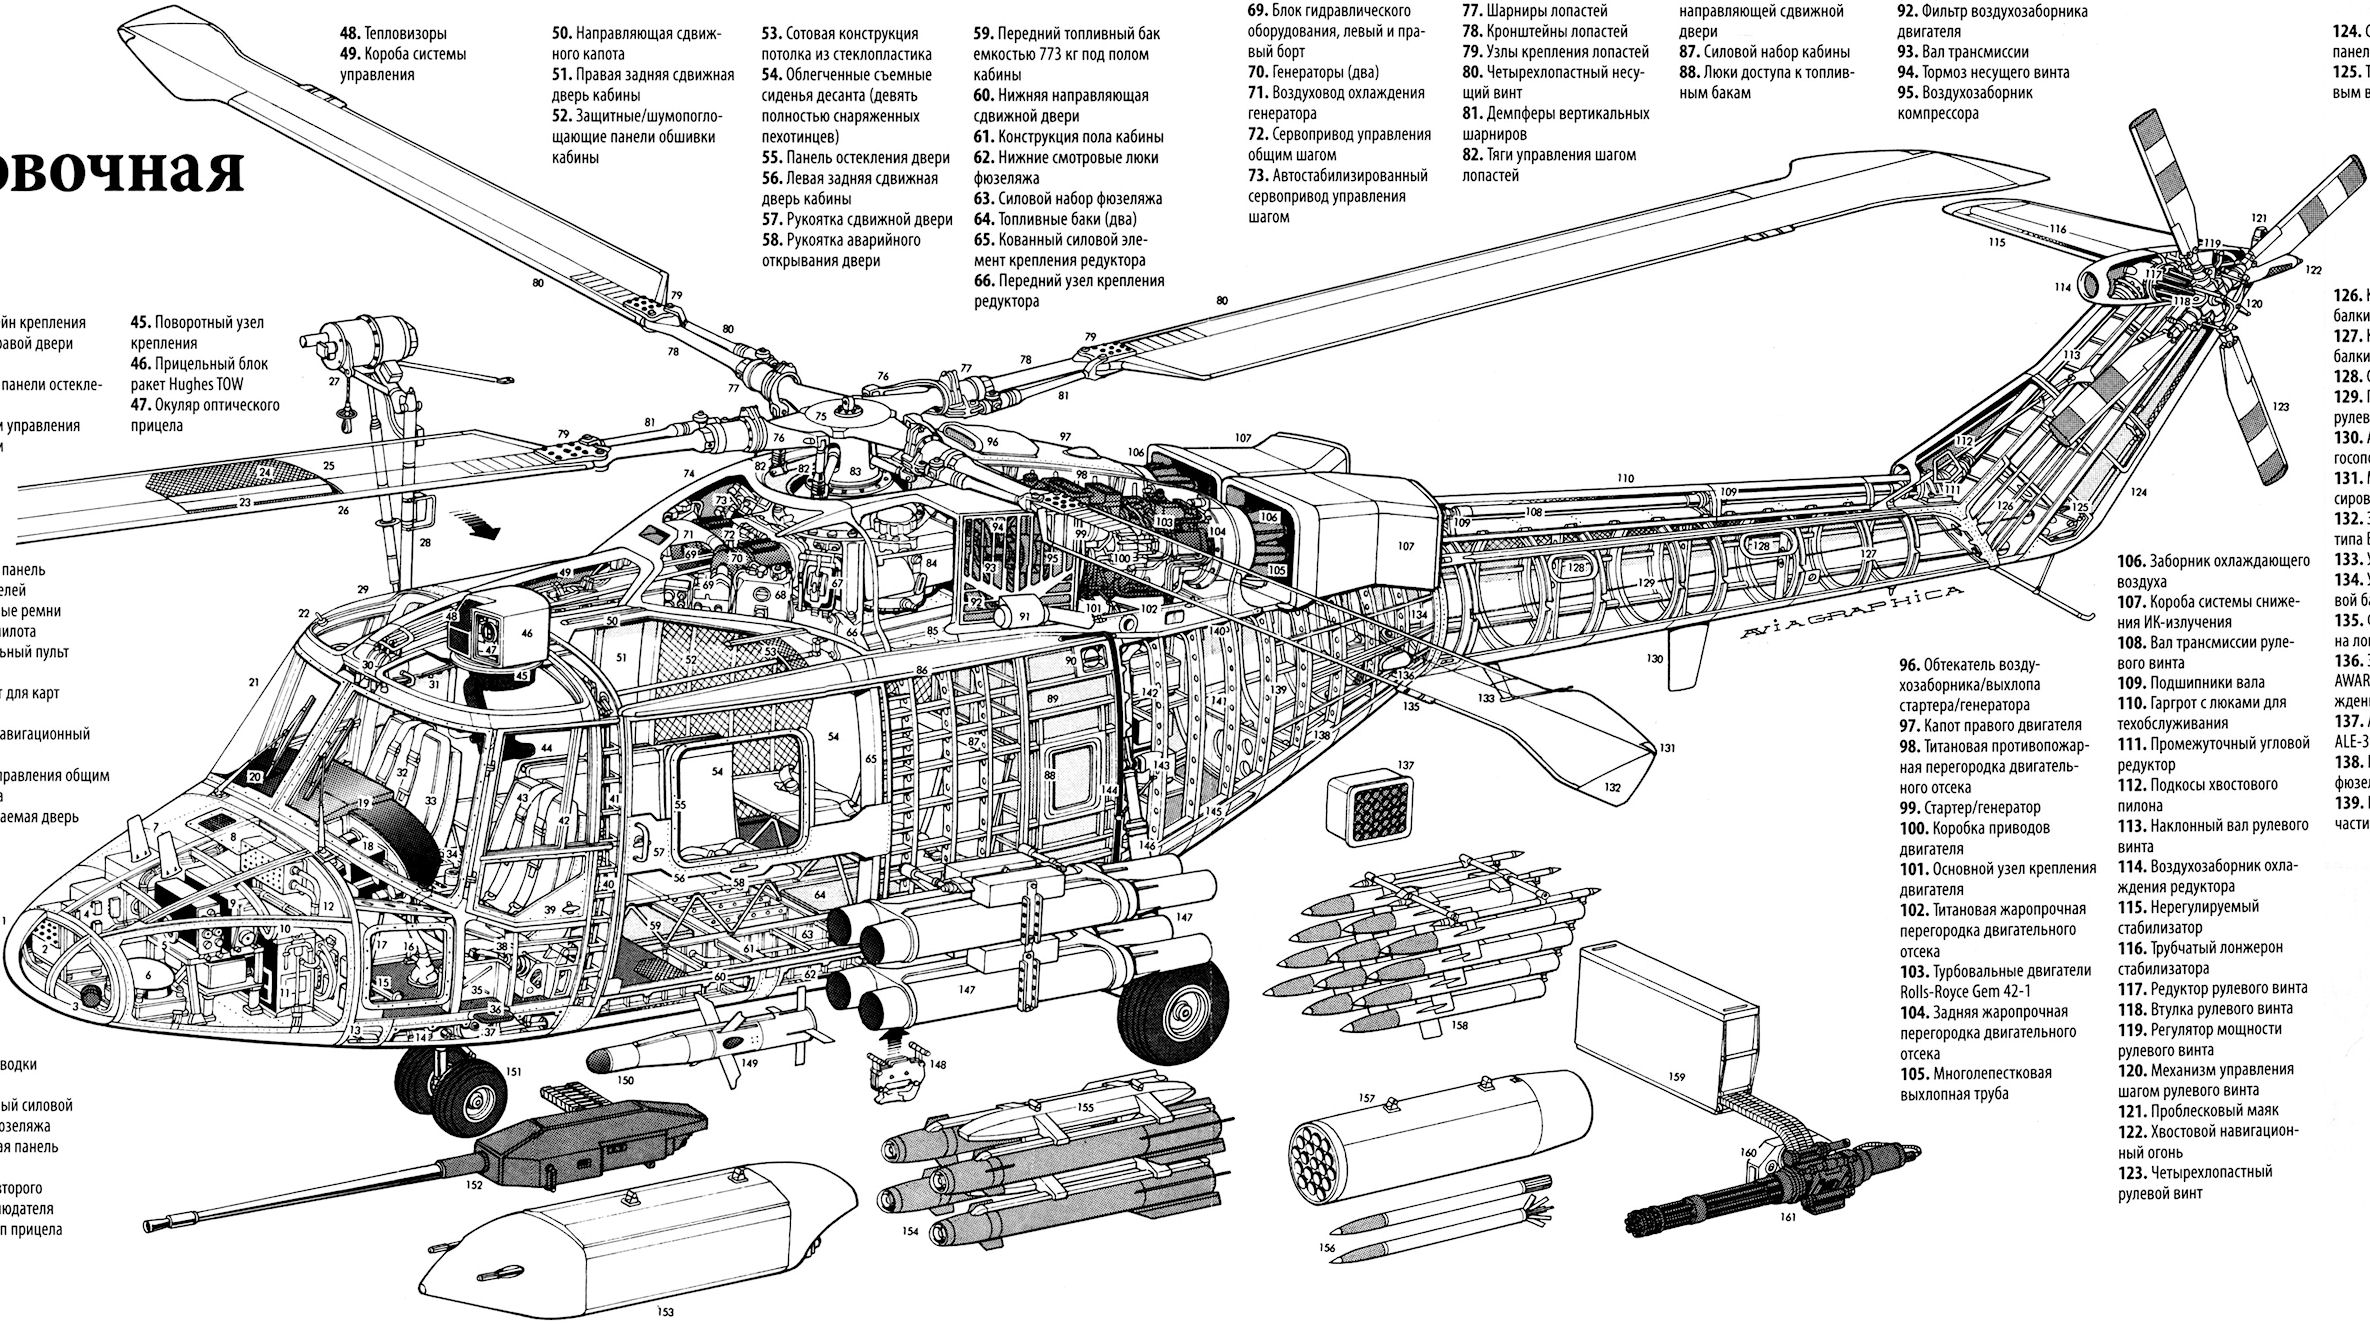 Desenhos Romanticos also Sujet49 455 also Car Audio Sketch furthermore Trunk Mat likewise Showthread. on ac cobra